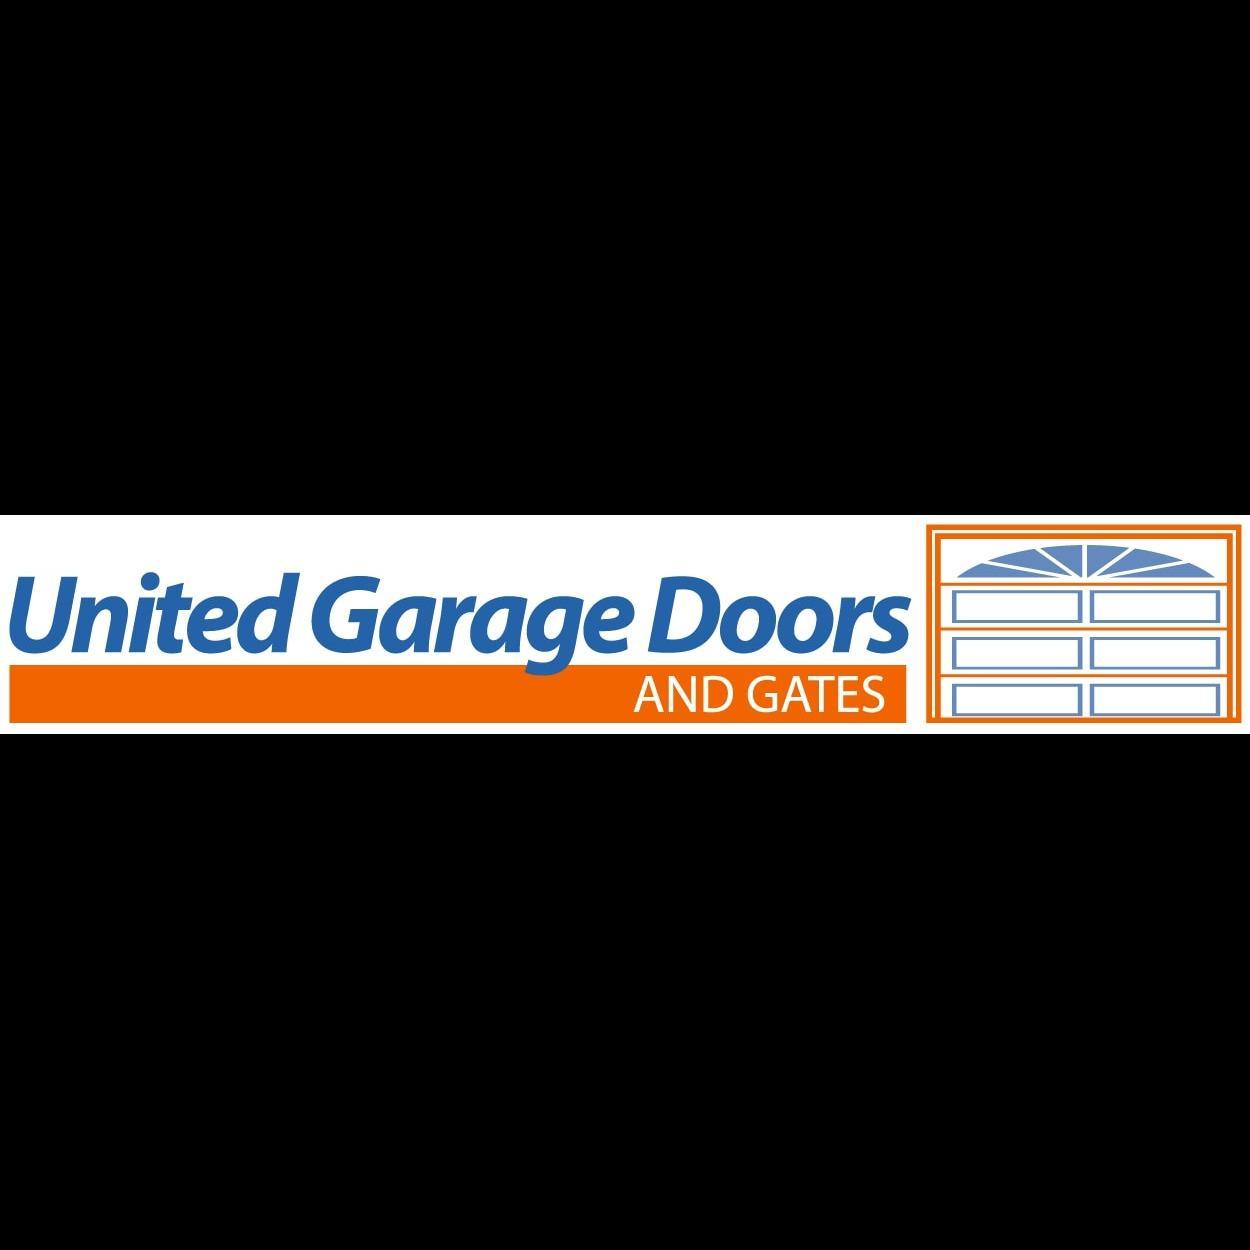 United Garage Doors & Gates